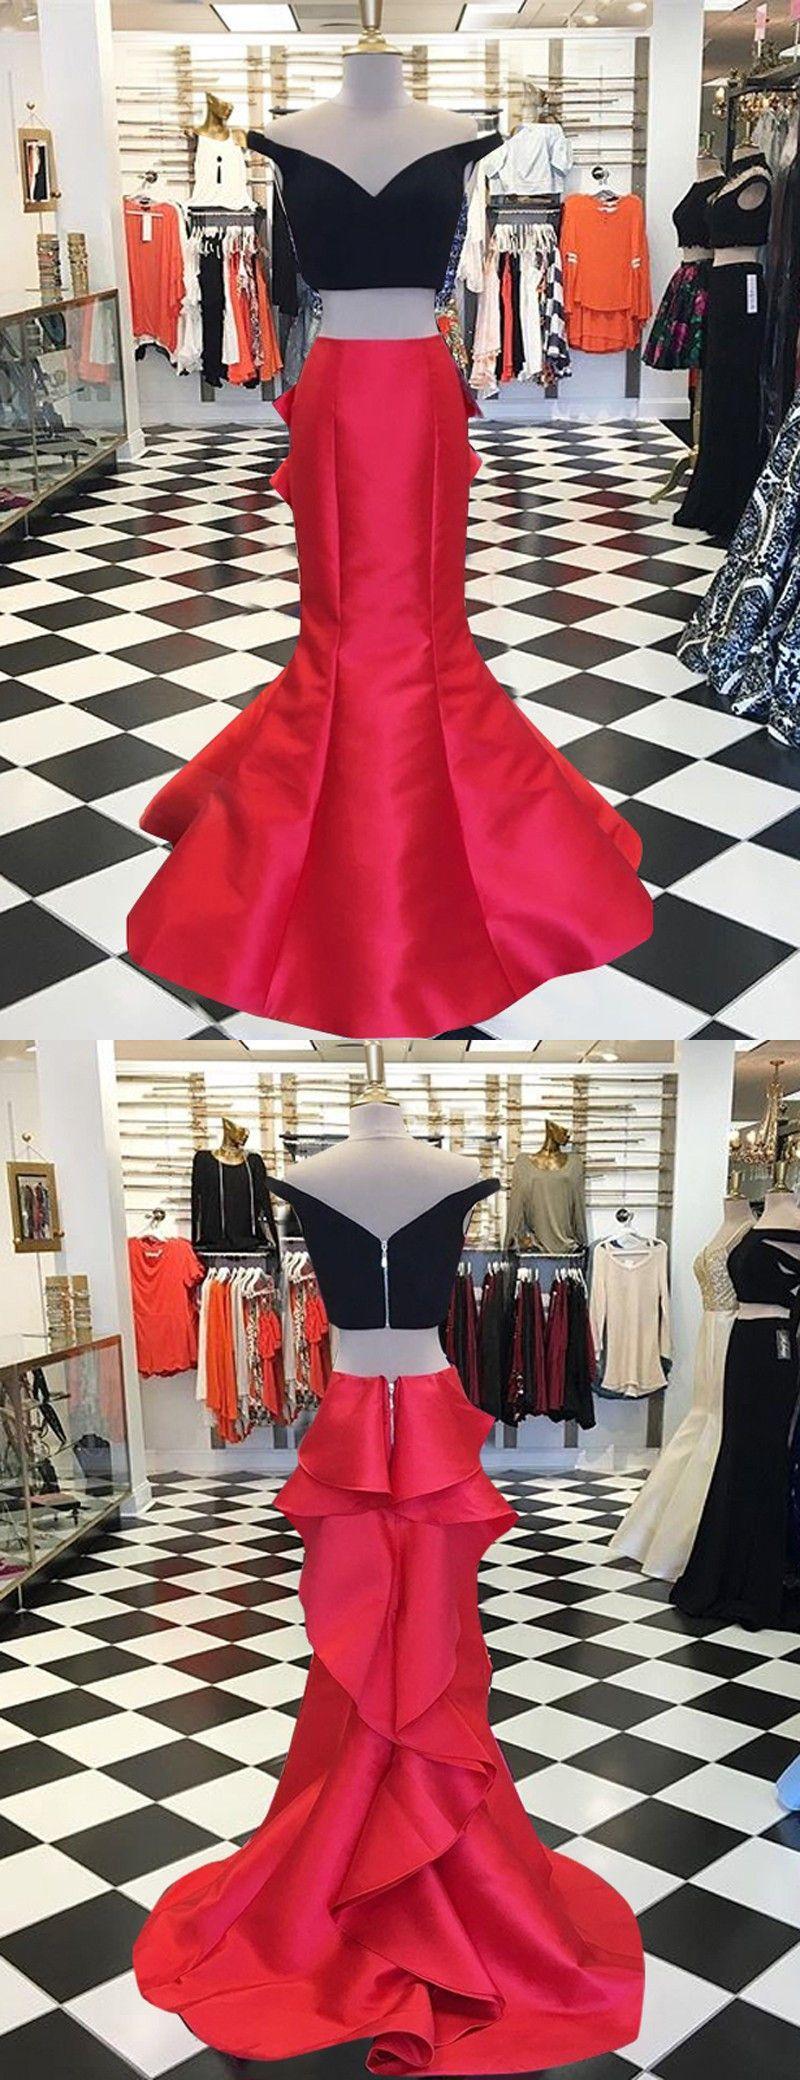 Long prom dressestwo piece prom dressesred prom dresses black